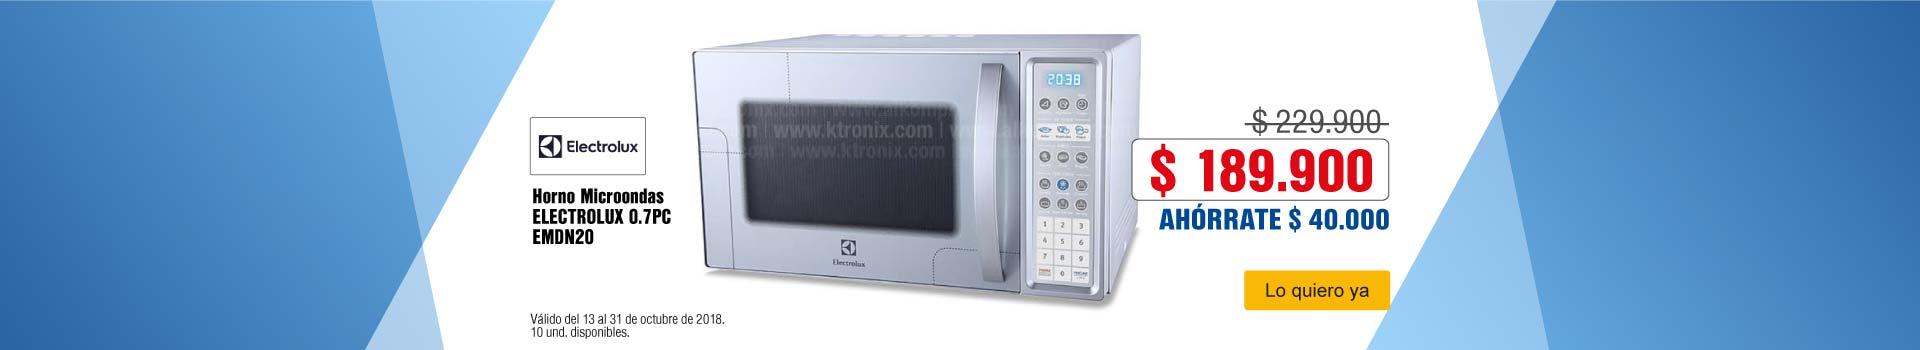 AK-KT-BCAT-2-MENORES-MICROONDAS-PP-ELECTROLUX -HORNO-MICROONDAS-0.7PC EMDN20-OCTUBRE-17